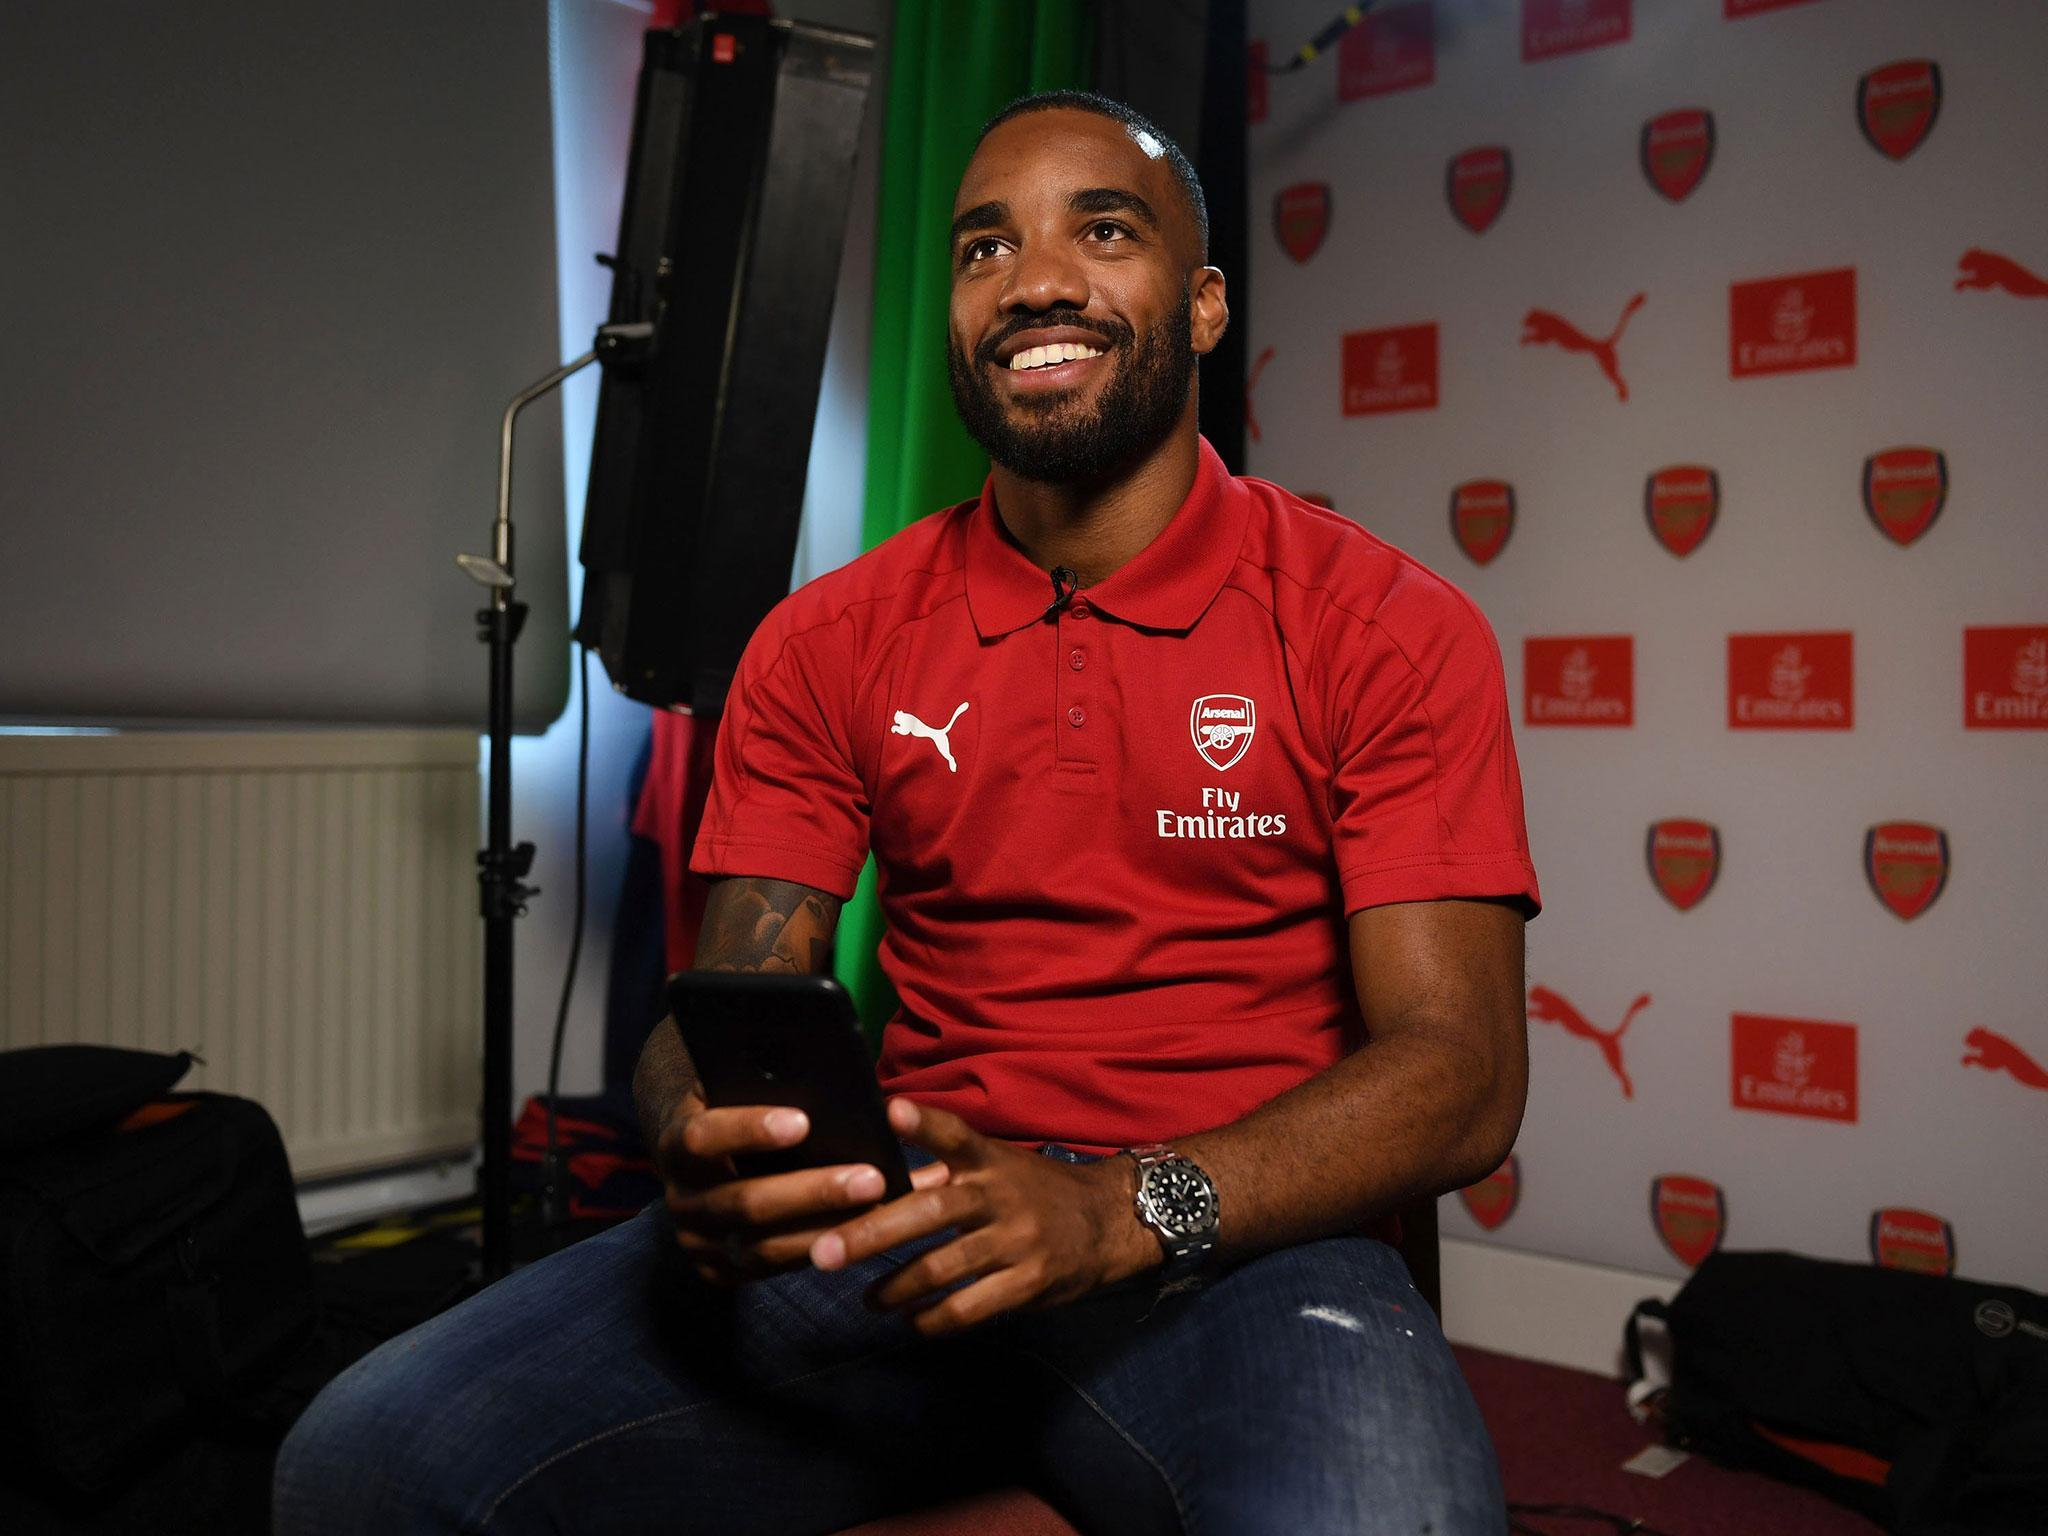 Alexandre Lacazette Explains Why He Chose Arsenal And